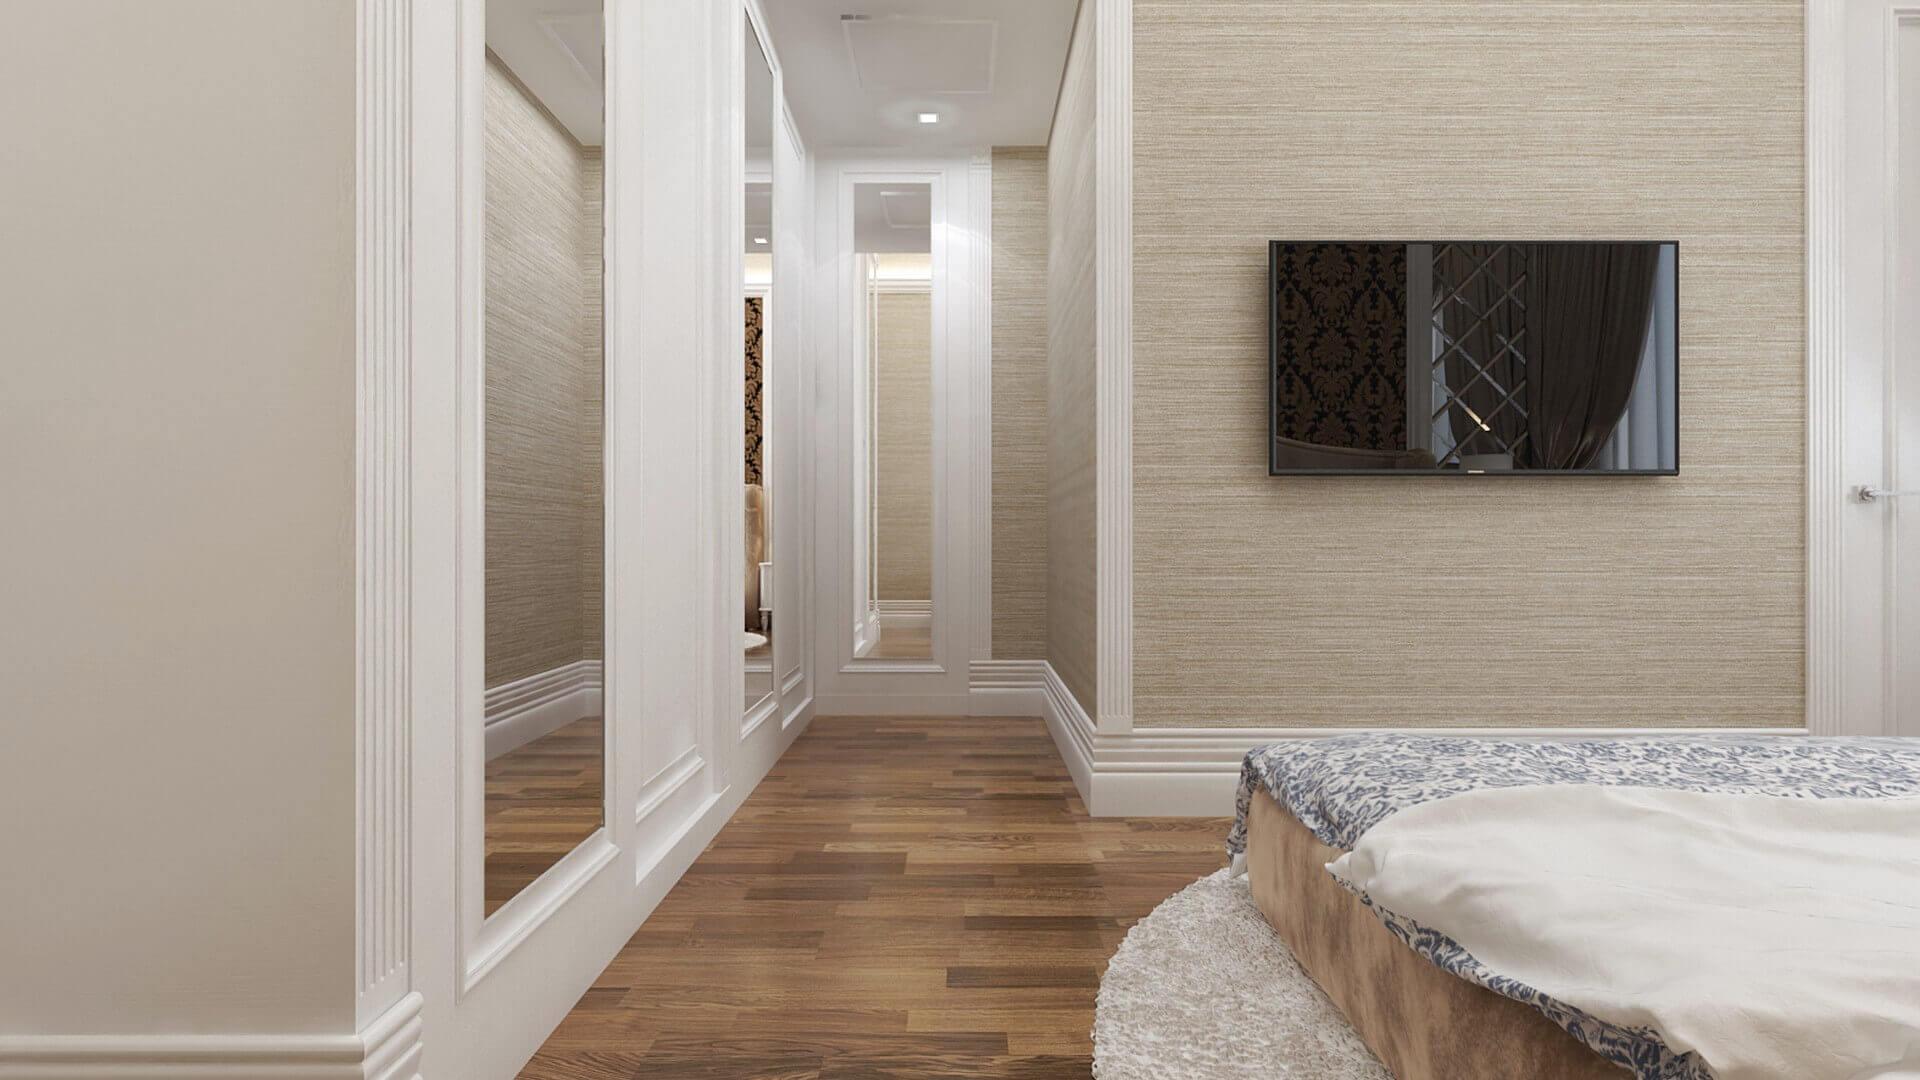 Sinpaş Altınoran 3299 S. Aslan Flat Residential